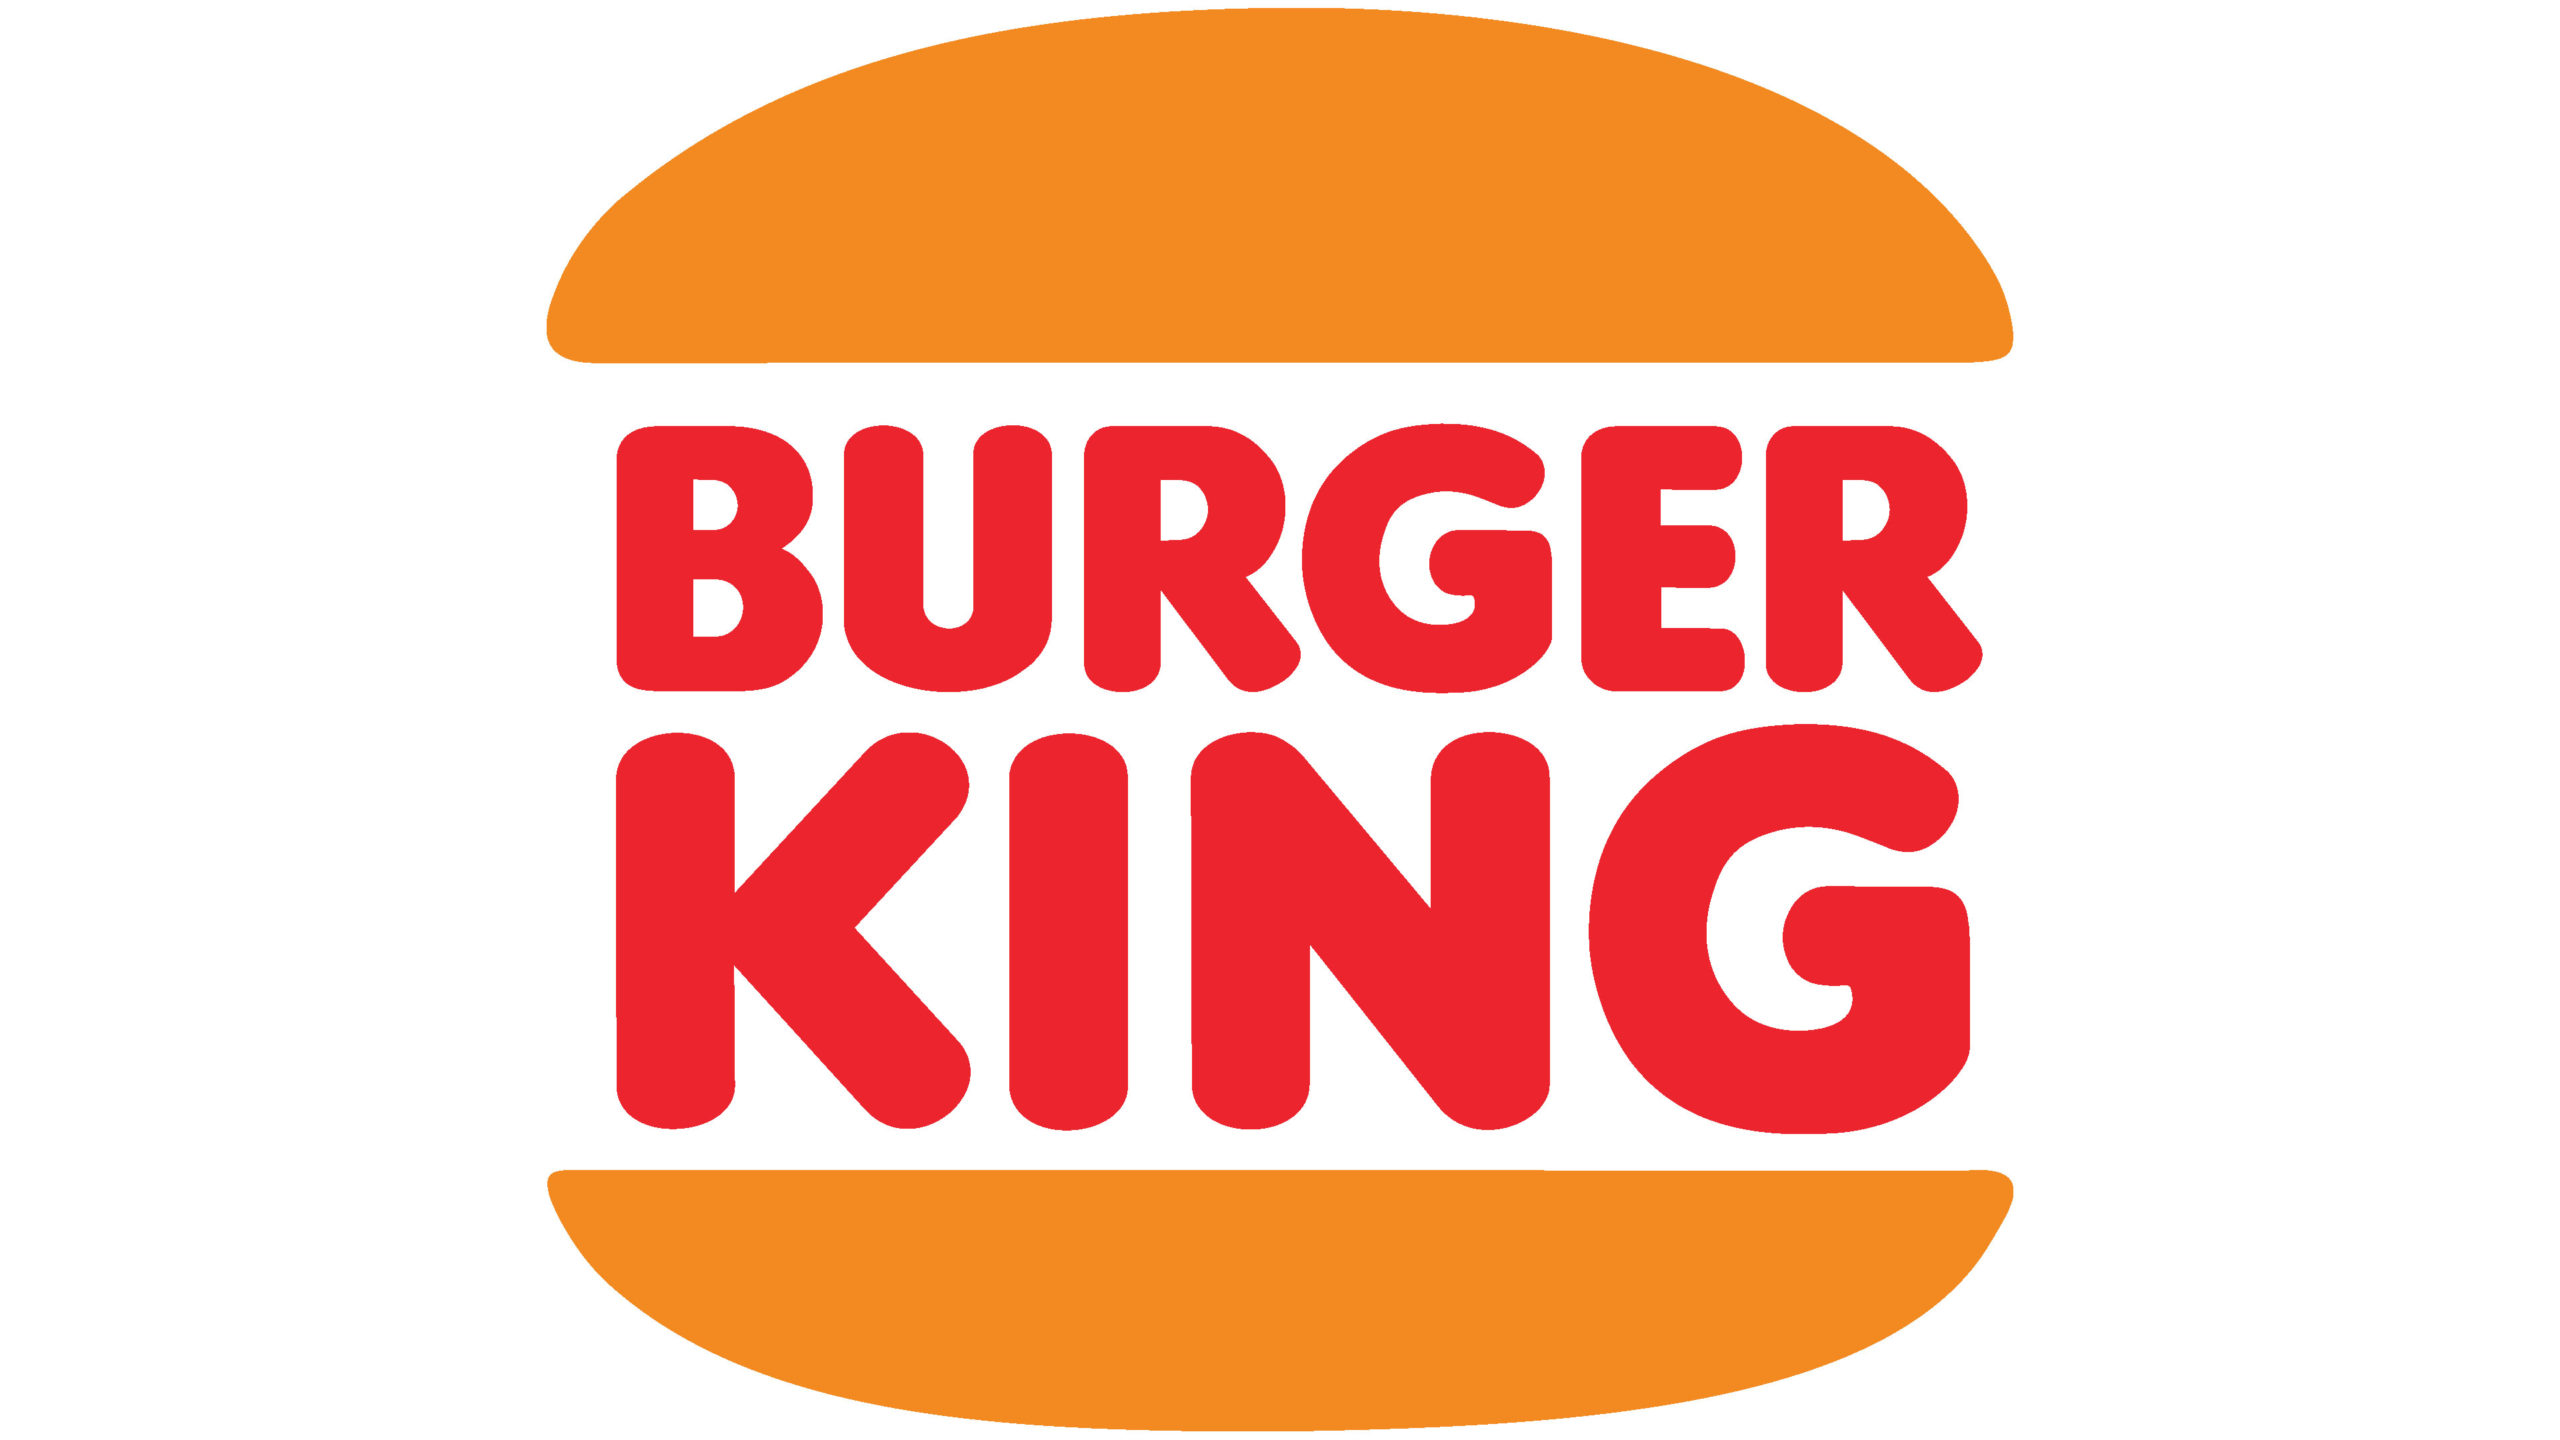 Burguer king new